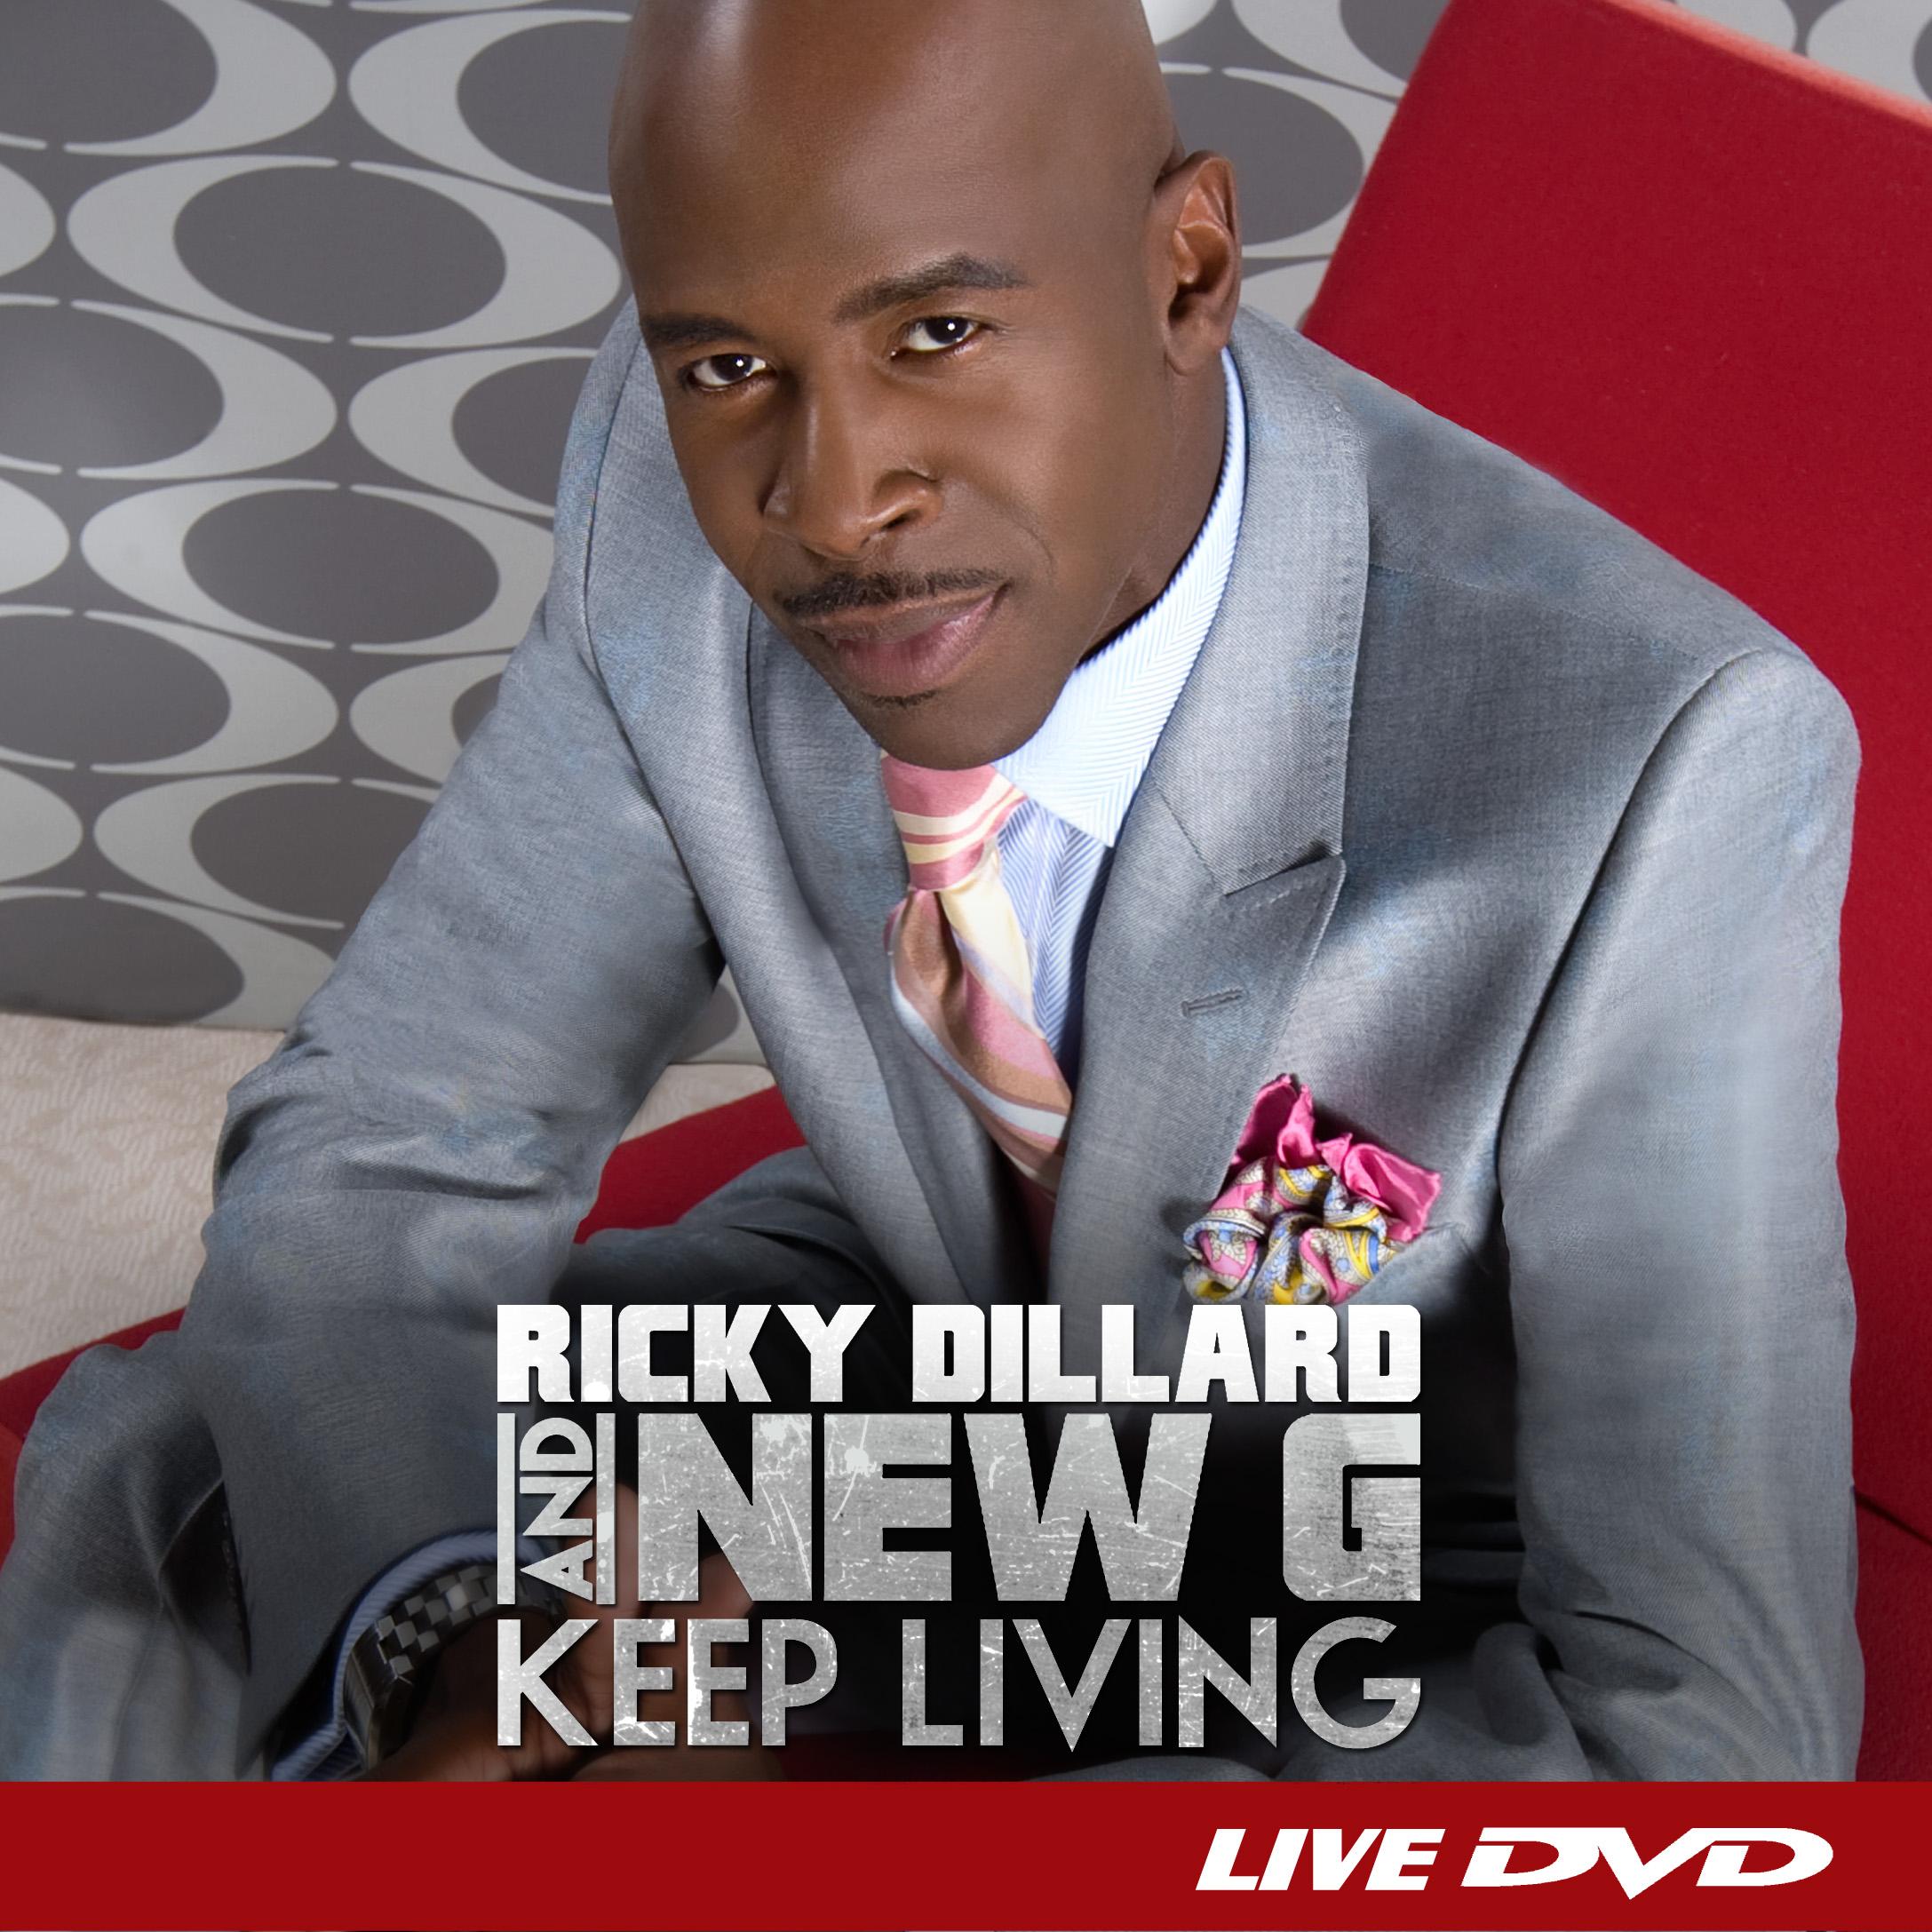 Ricky Dillard & New G - Keep Living (DVD Amray)